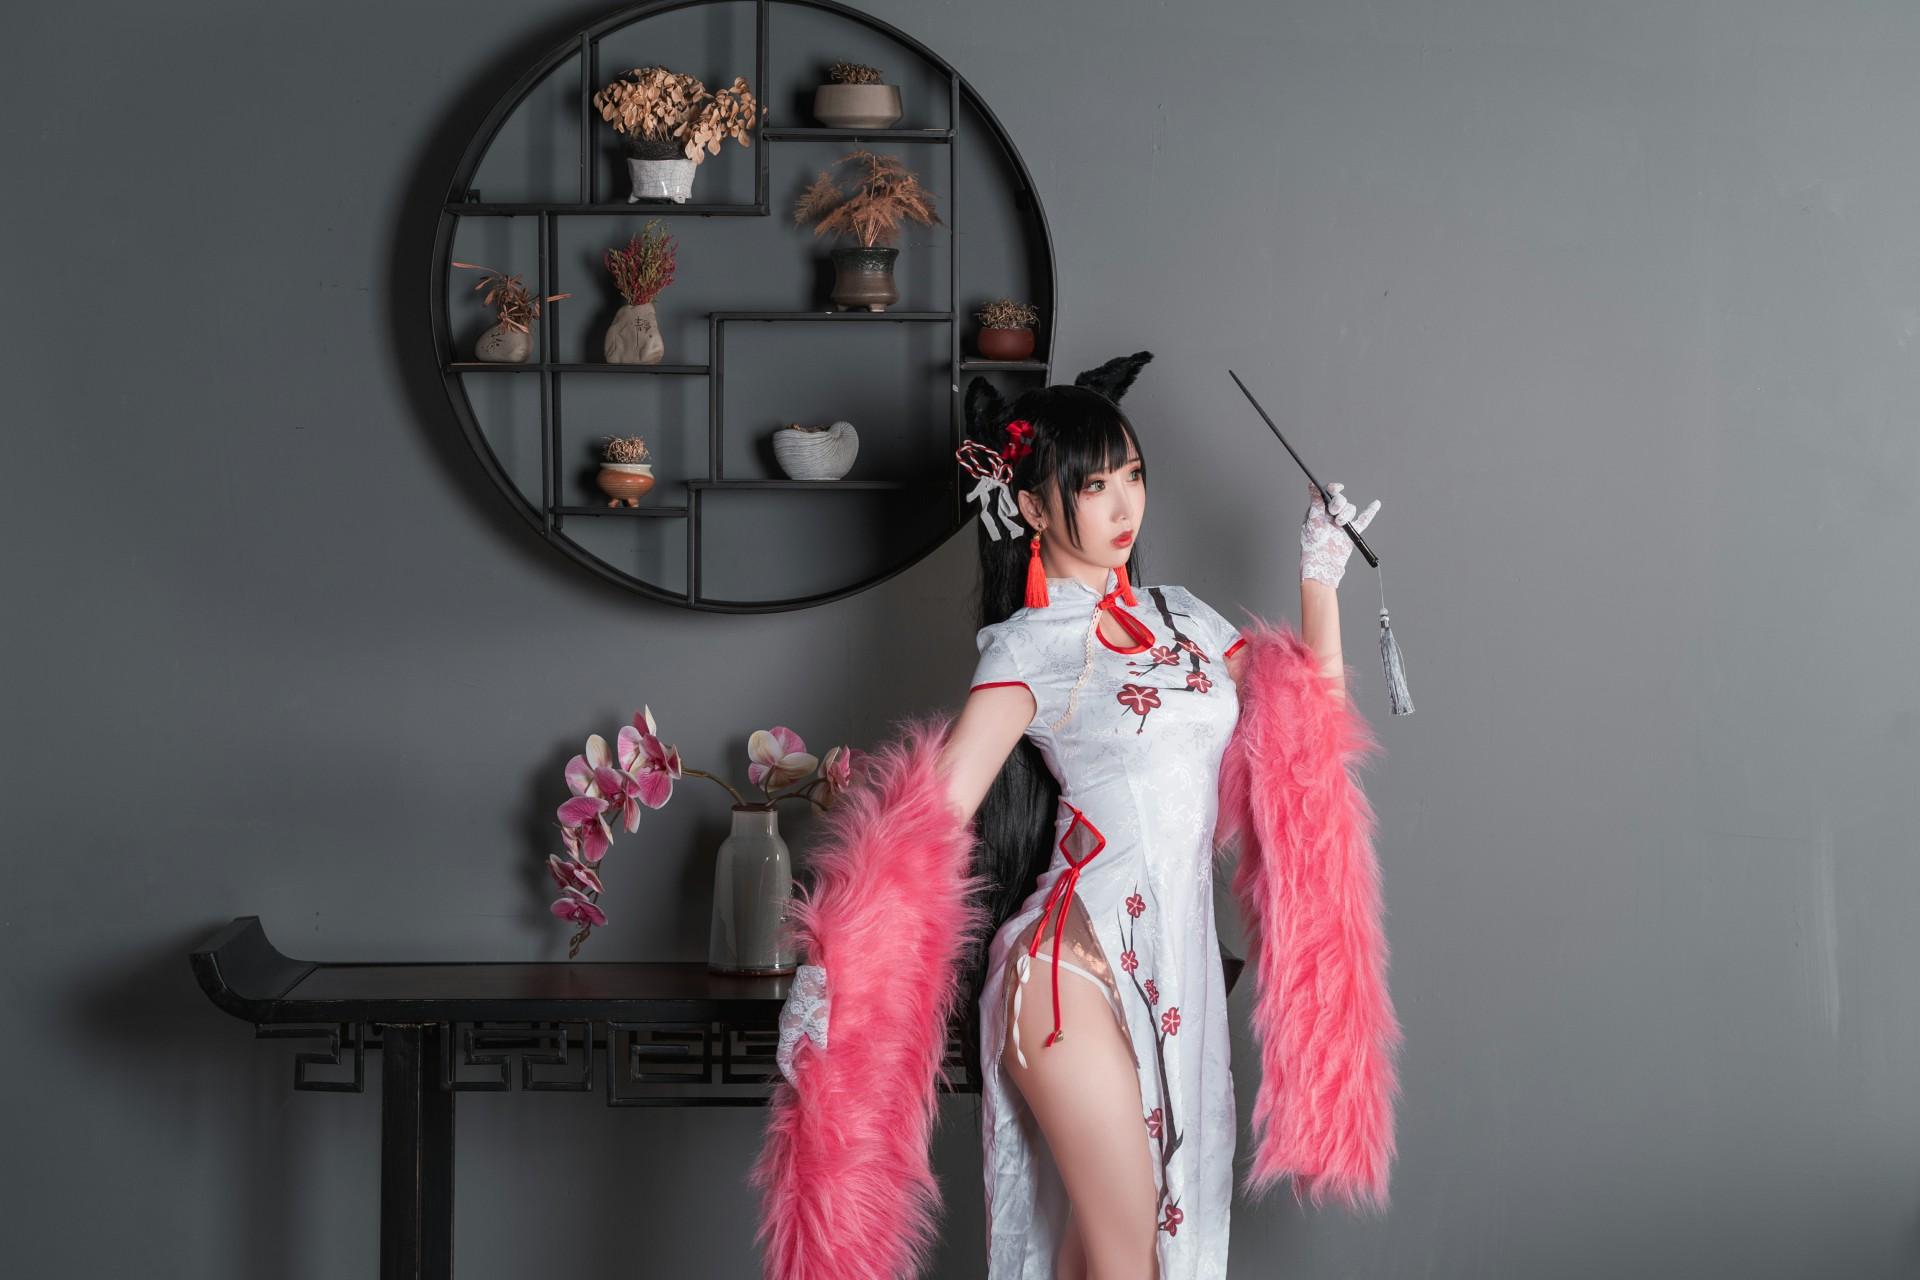 [Cosplay]面饼仙儿 - 旗袍爱宕 第3张